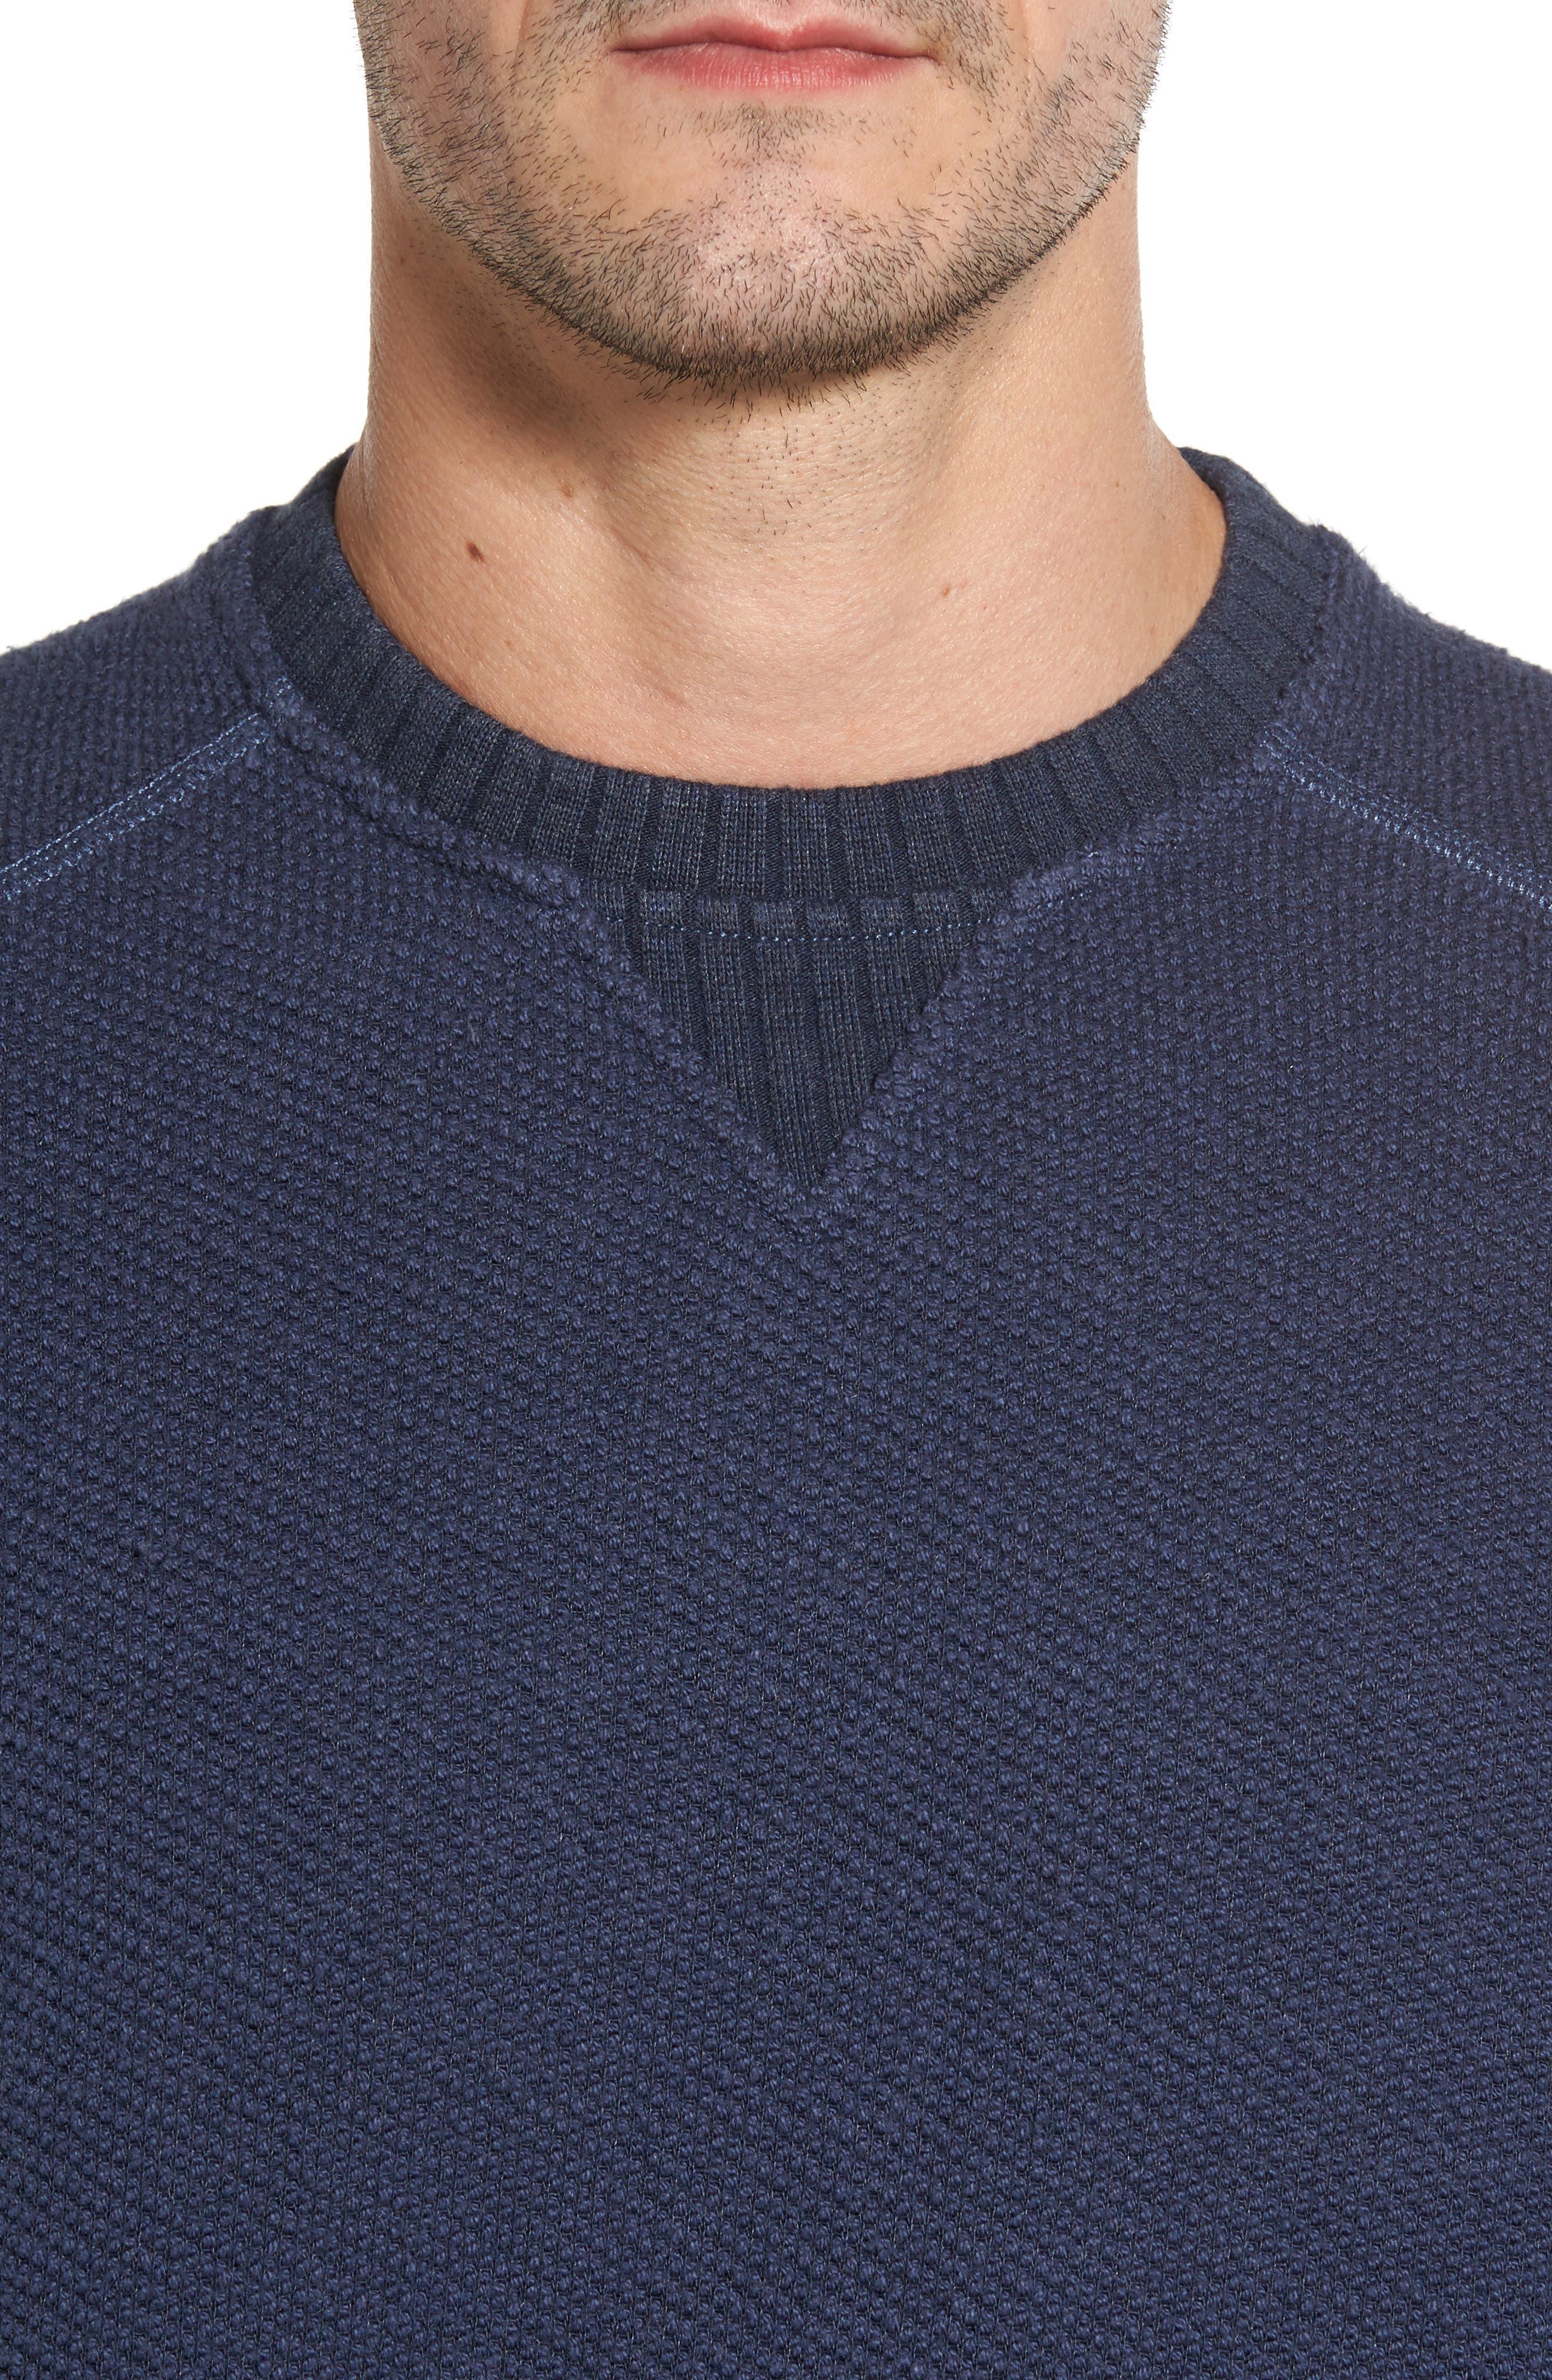 Surfari Crewneck Sweatshirt,                             Alternate thumbnail 4, color,                             001